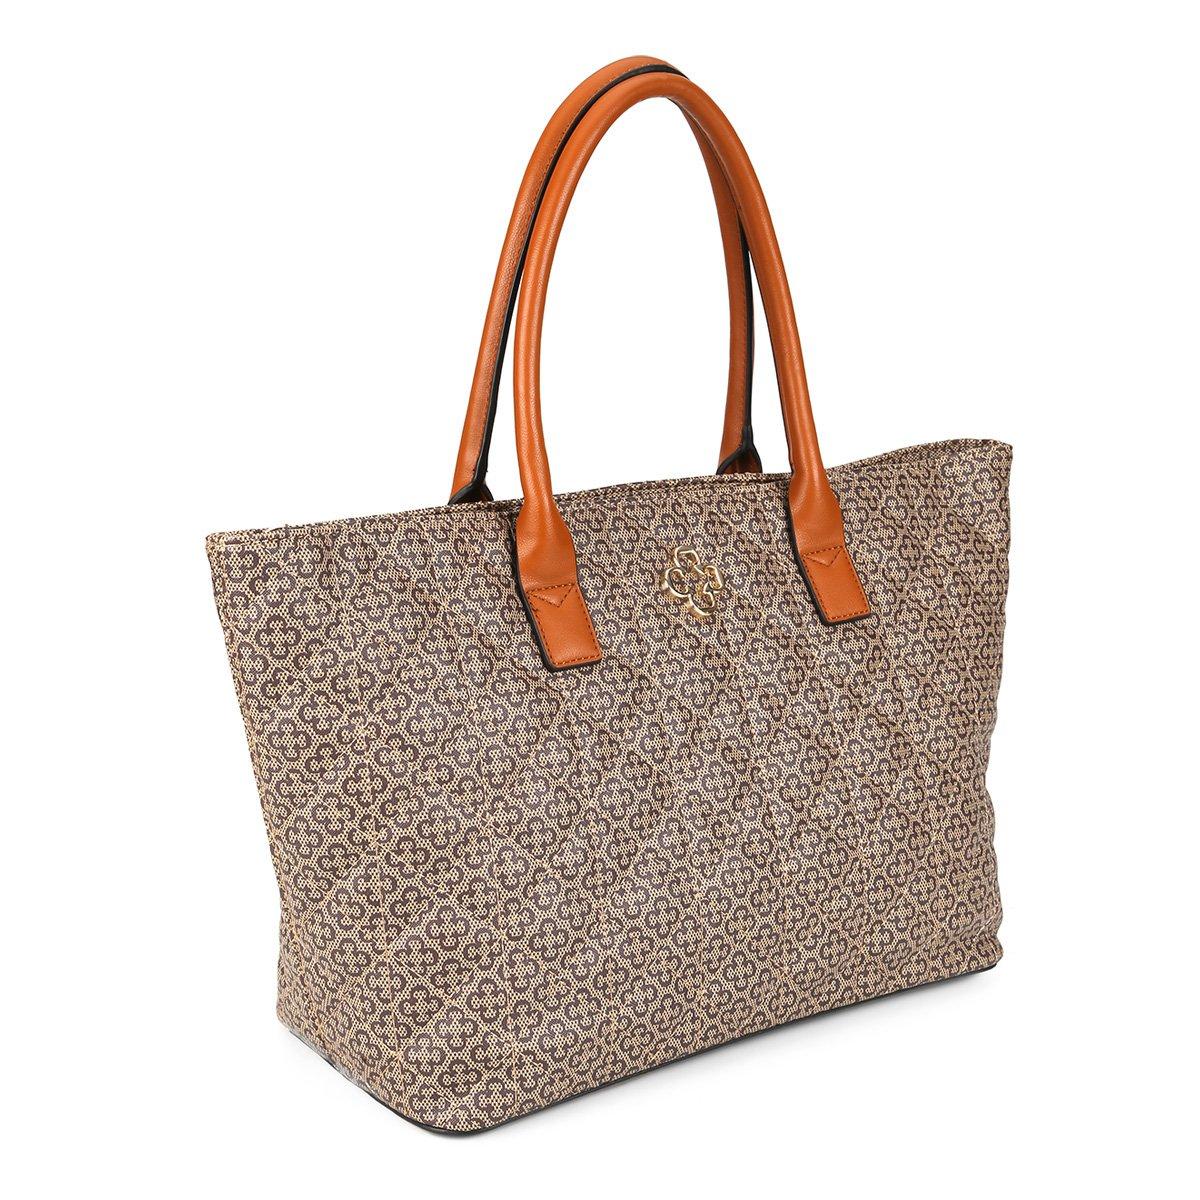 Bolsa Matelassê Capodarte Shopper Shopper Capodarte Caramelo Bolsa Feminina Matelassê Feminina xptq1n